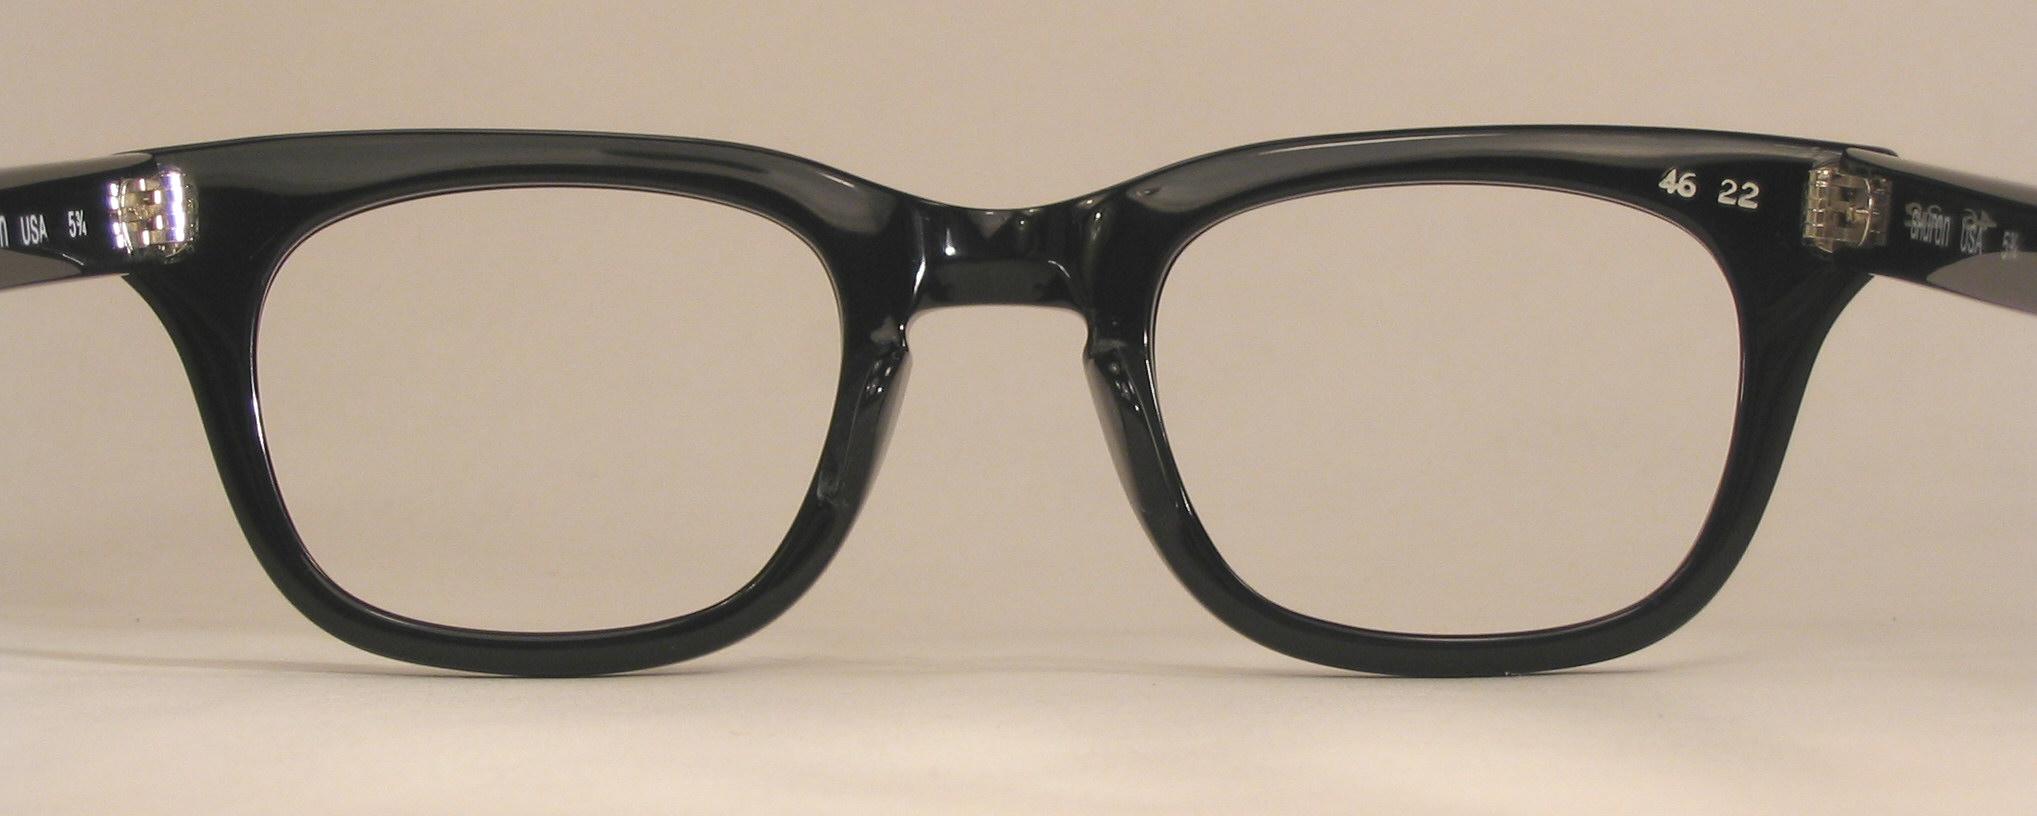 Glasses Clip On Side Shields Www Tapdance Org